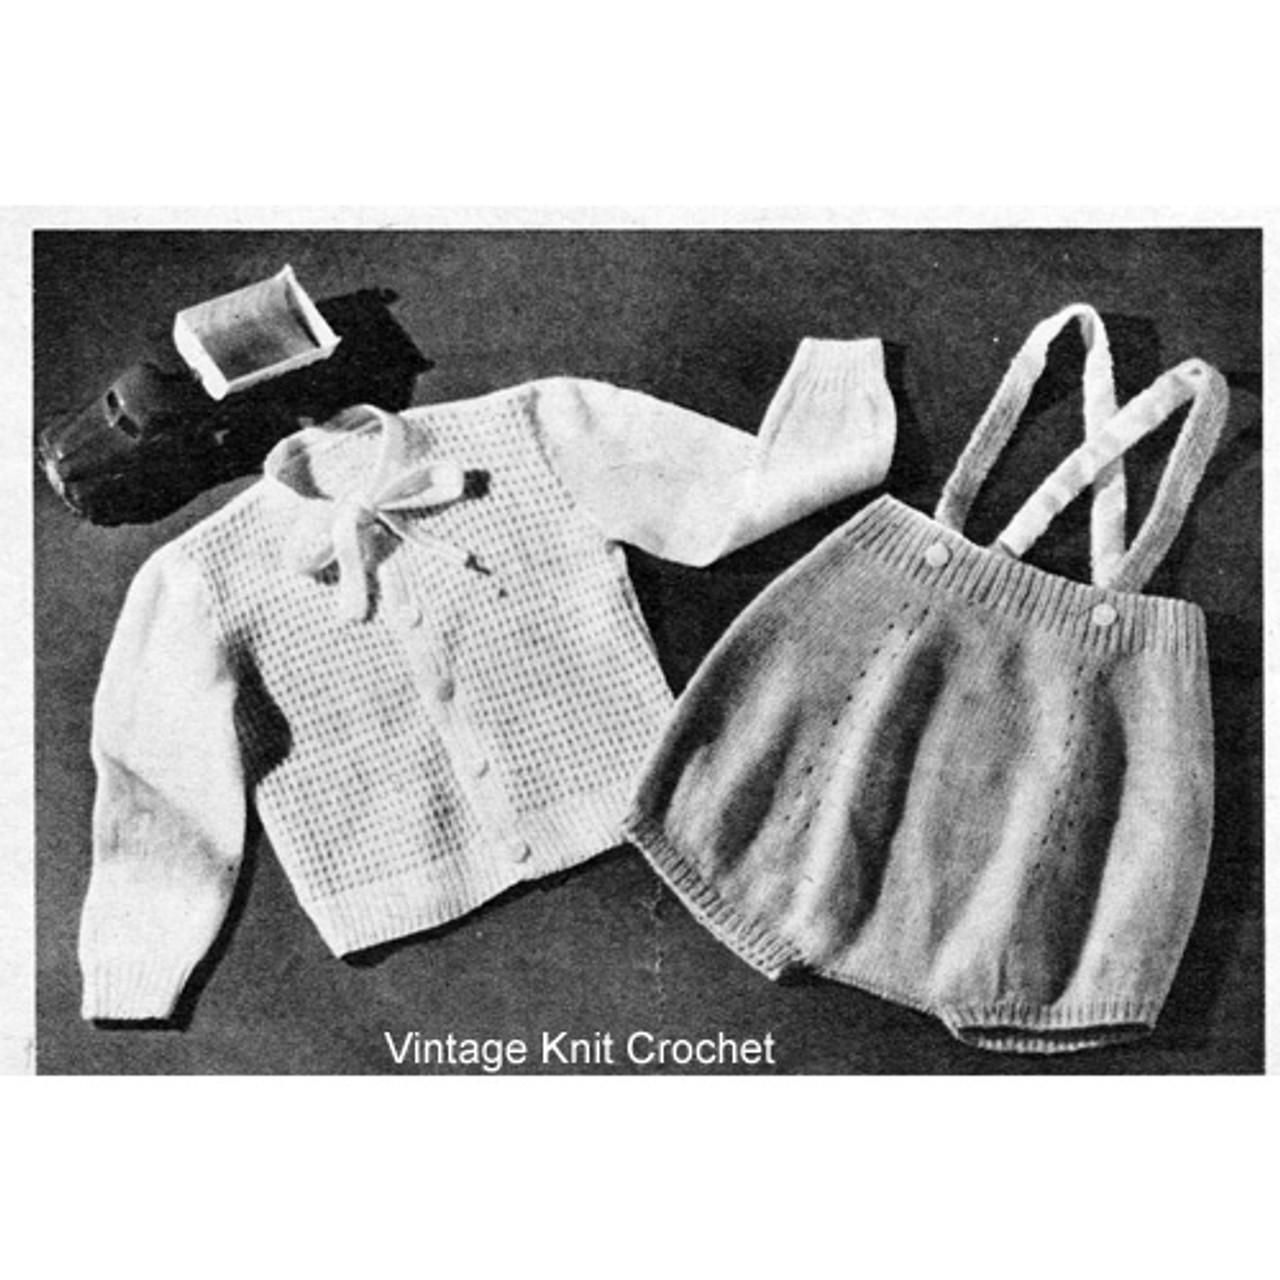 Vintage Baby Knitted Romper Pattern Set, 1950s